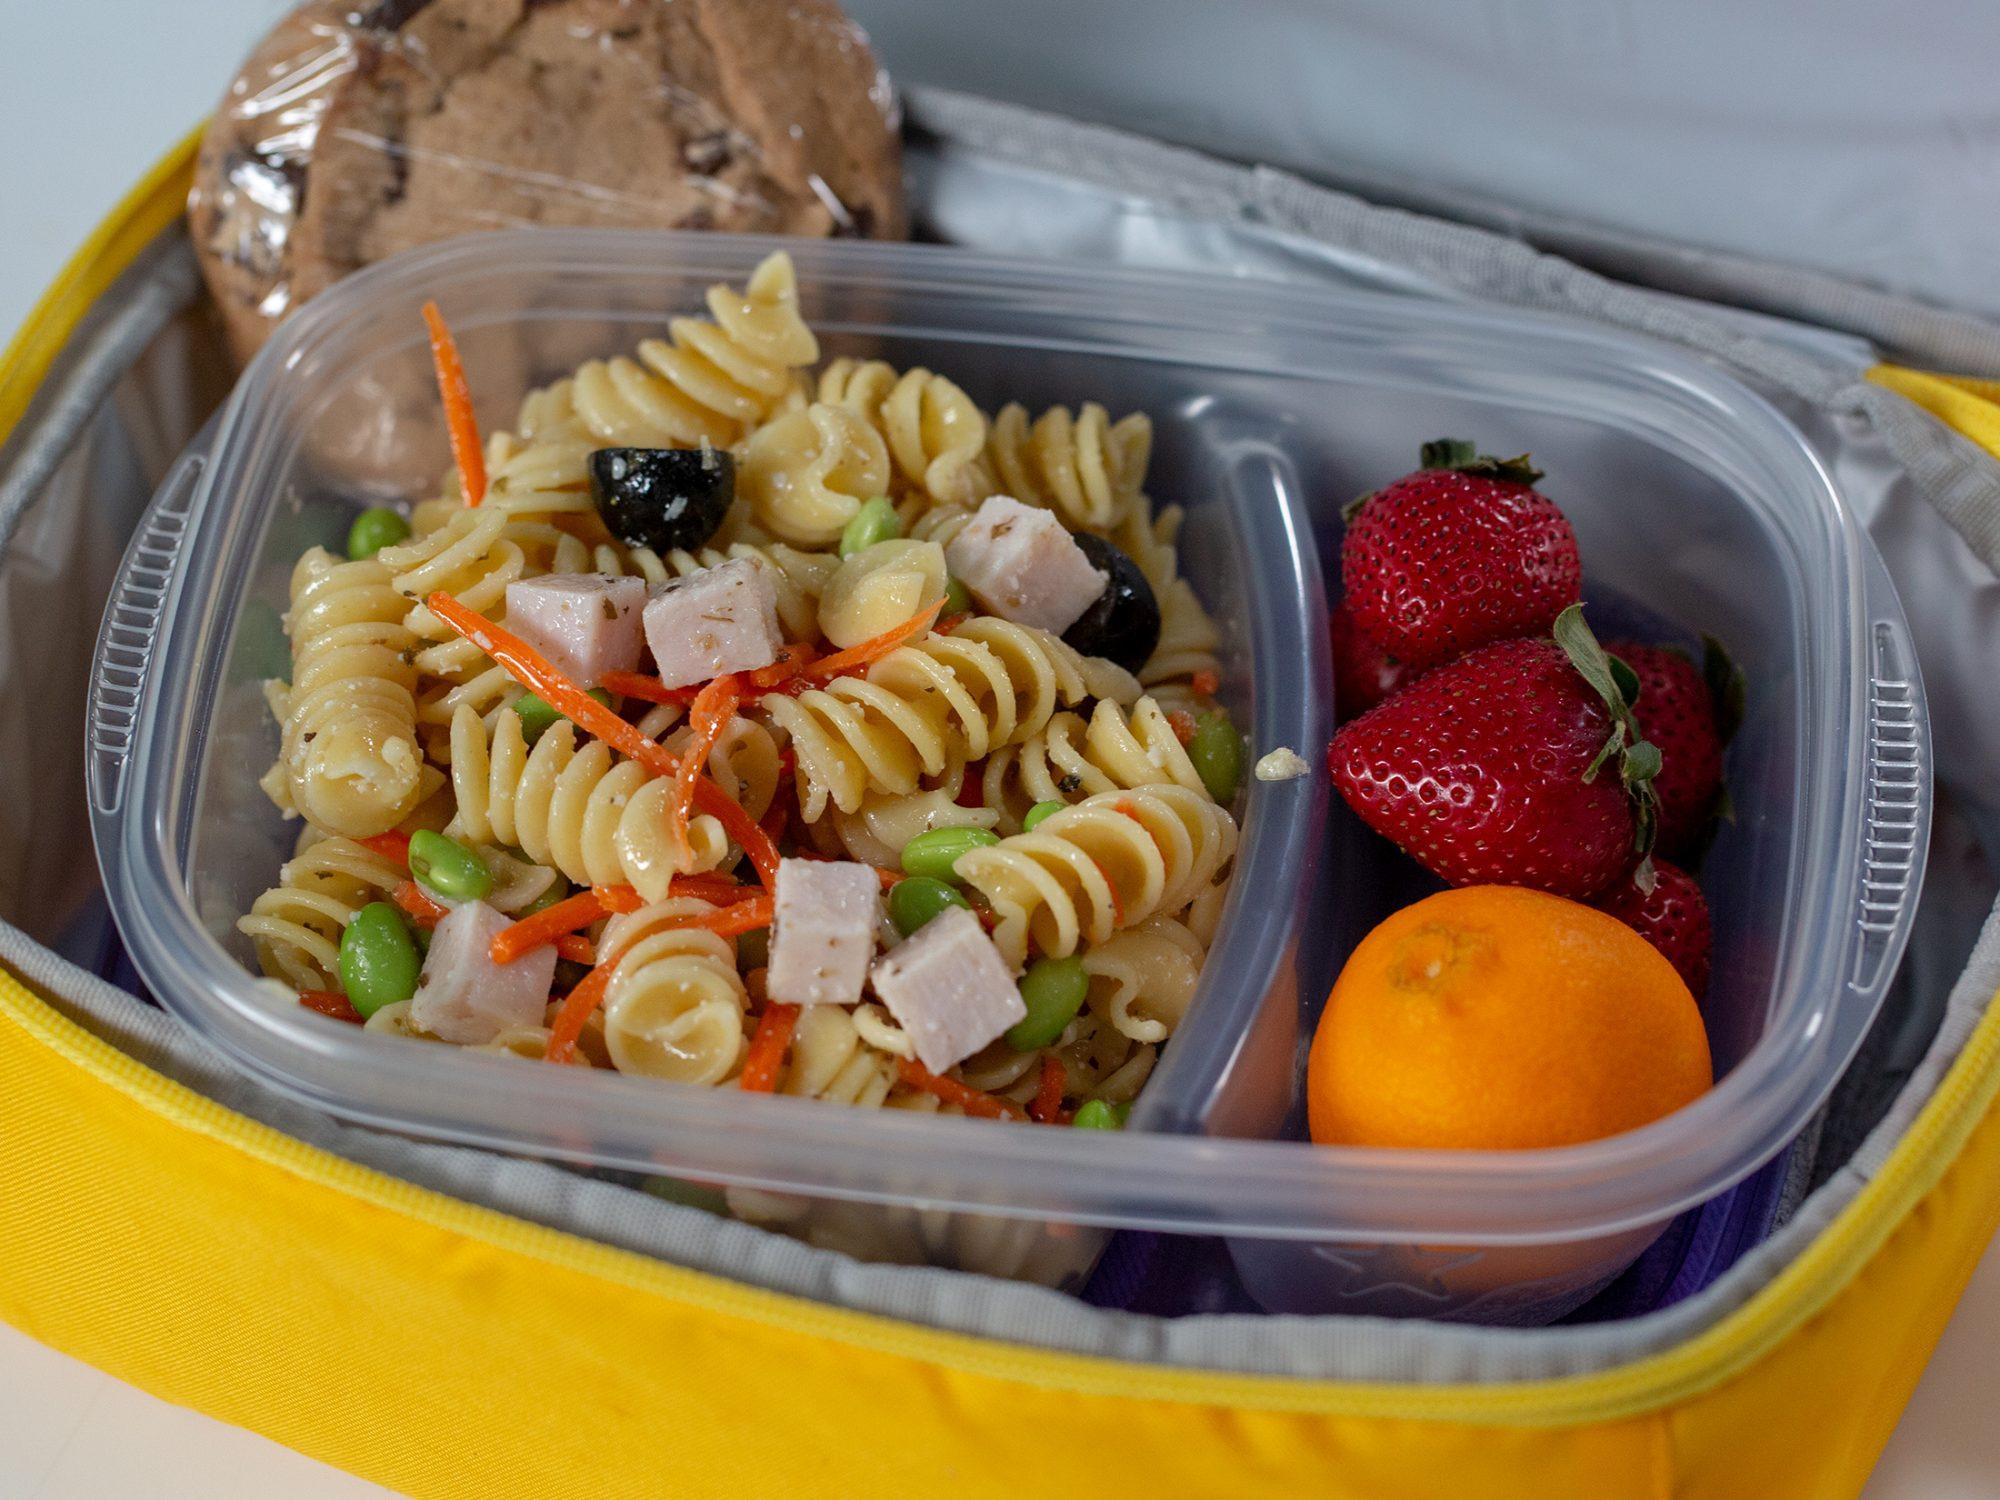 Leftovers Lunchbox Pasta Salad image